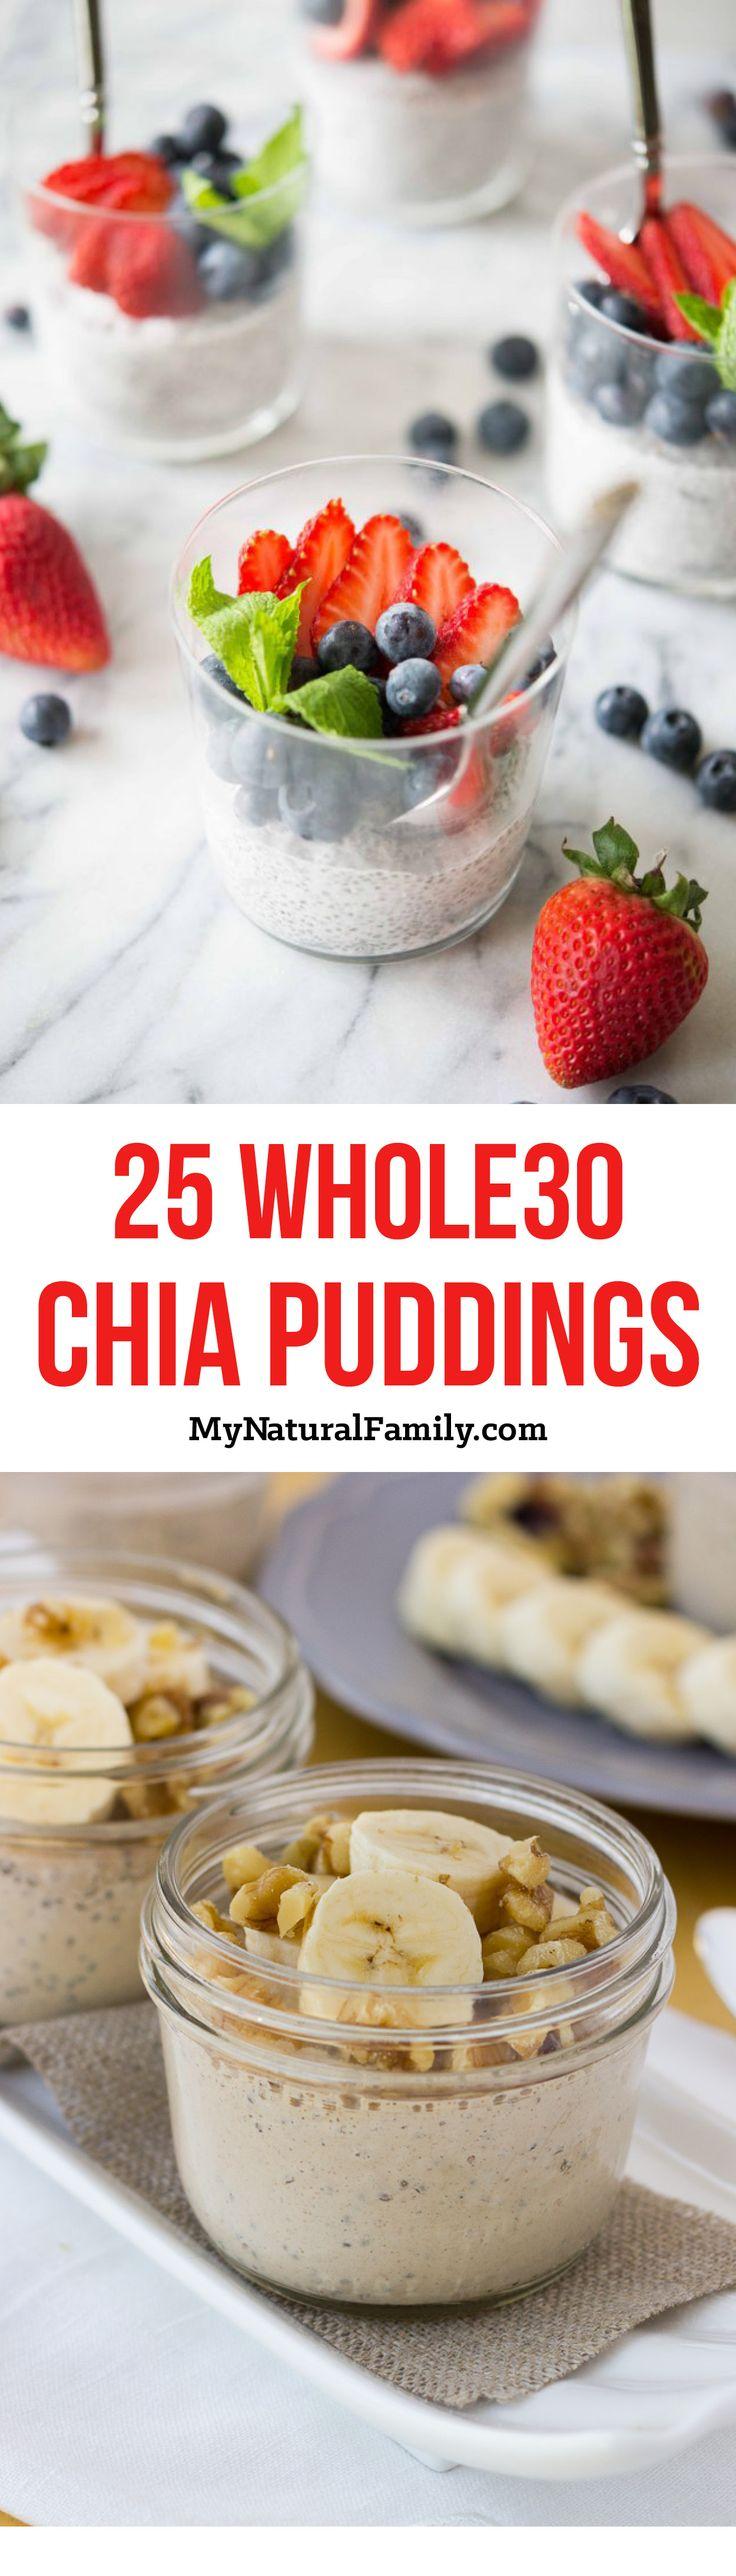 25 Whole30 Breakfast Chia Pudding Recipes